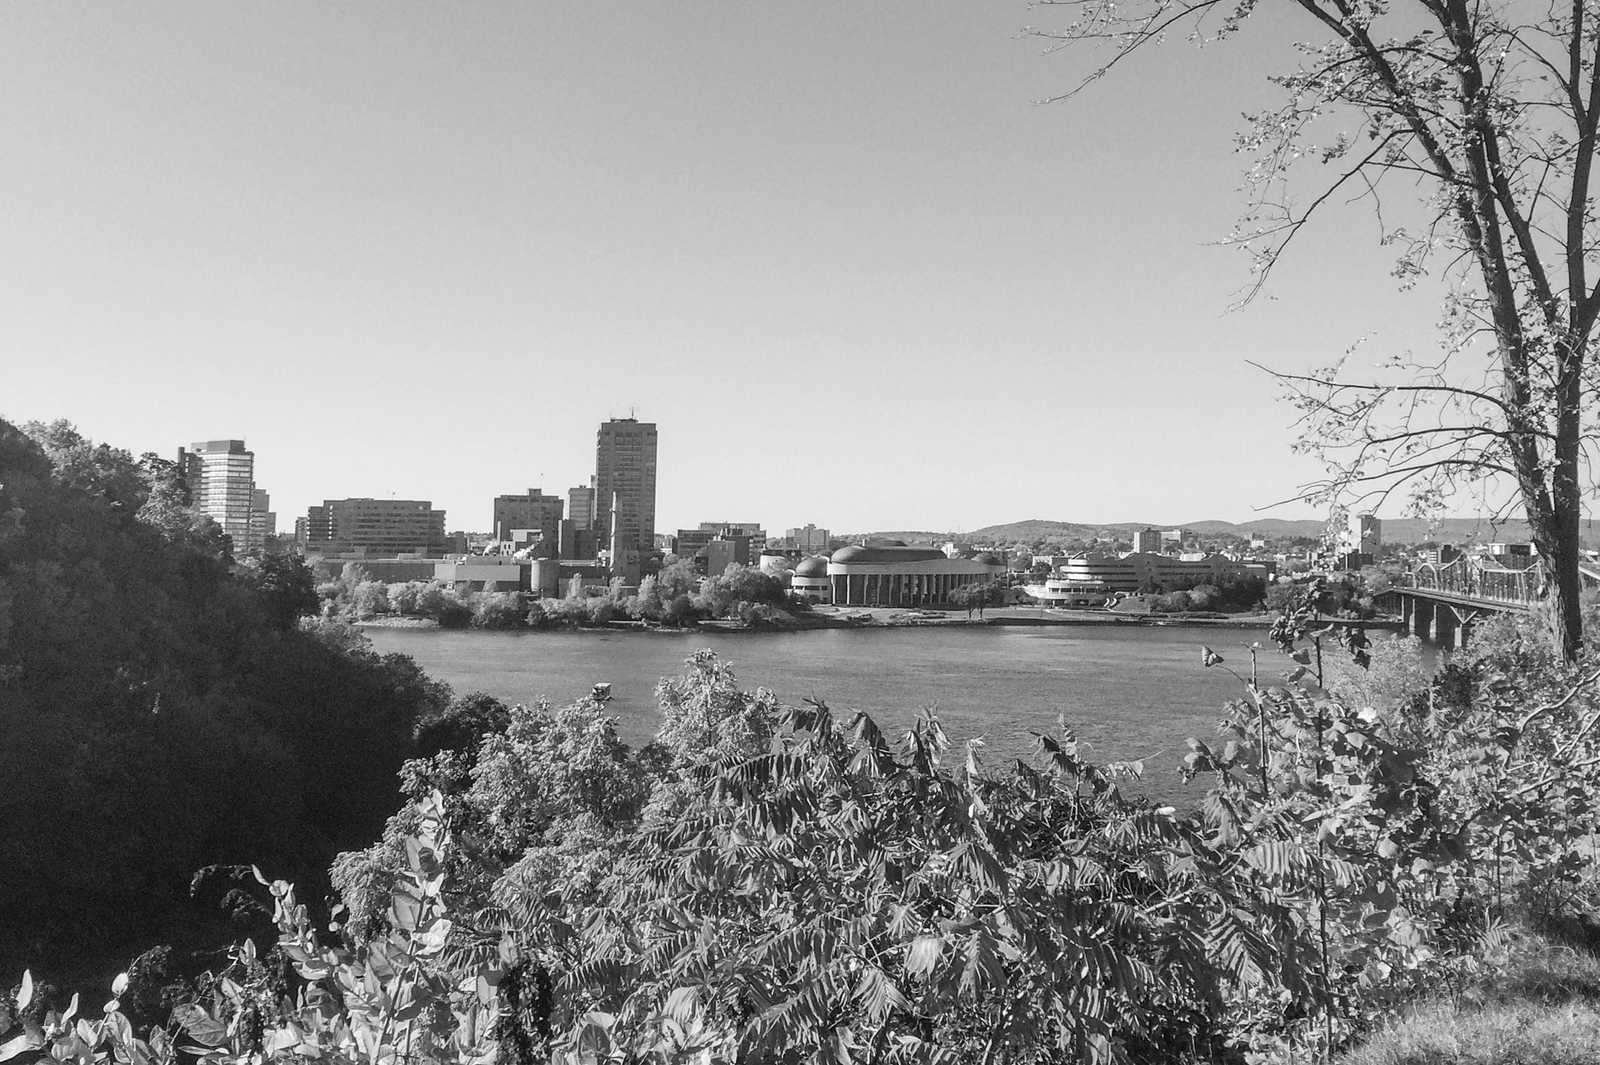 Major's Hill Park in Ottawa